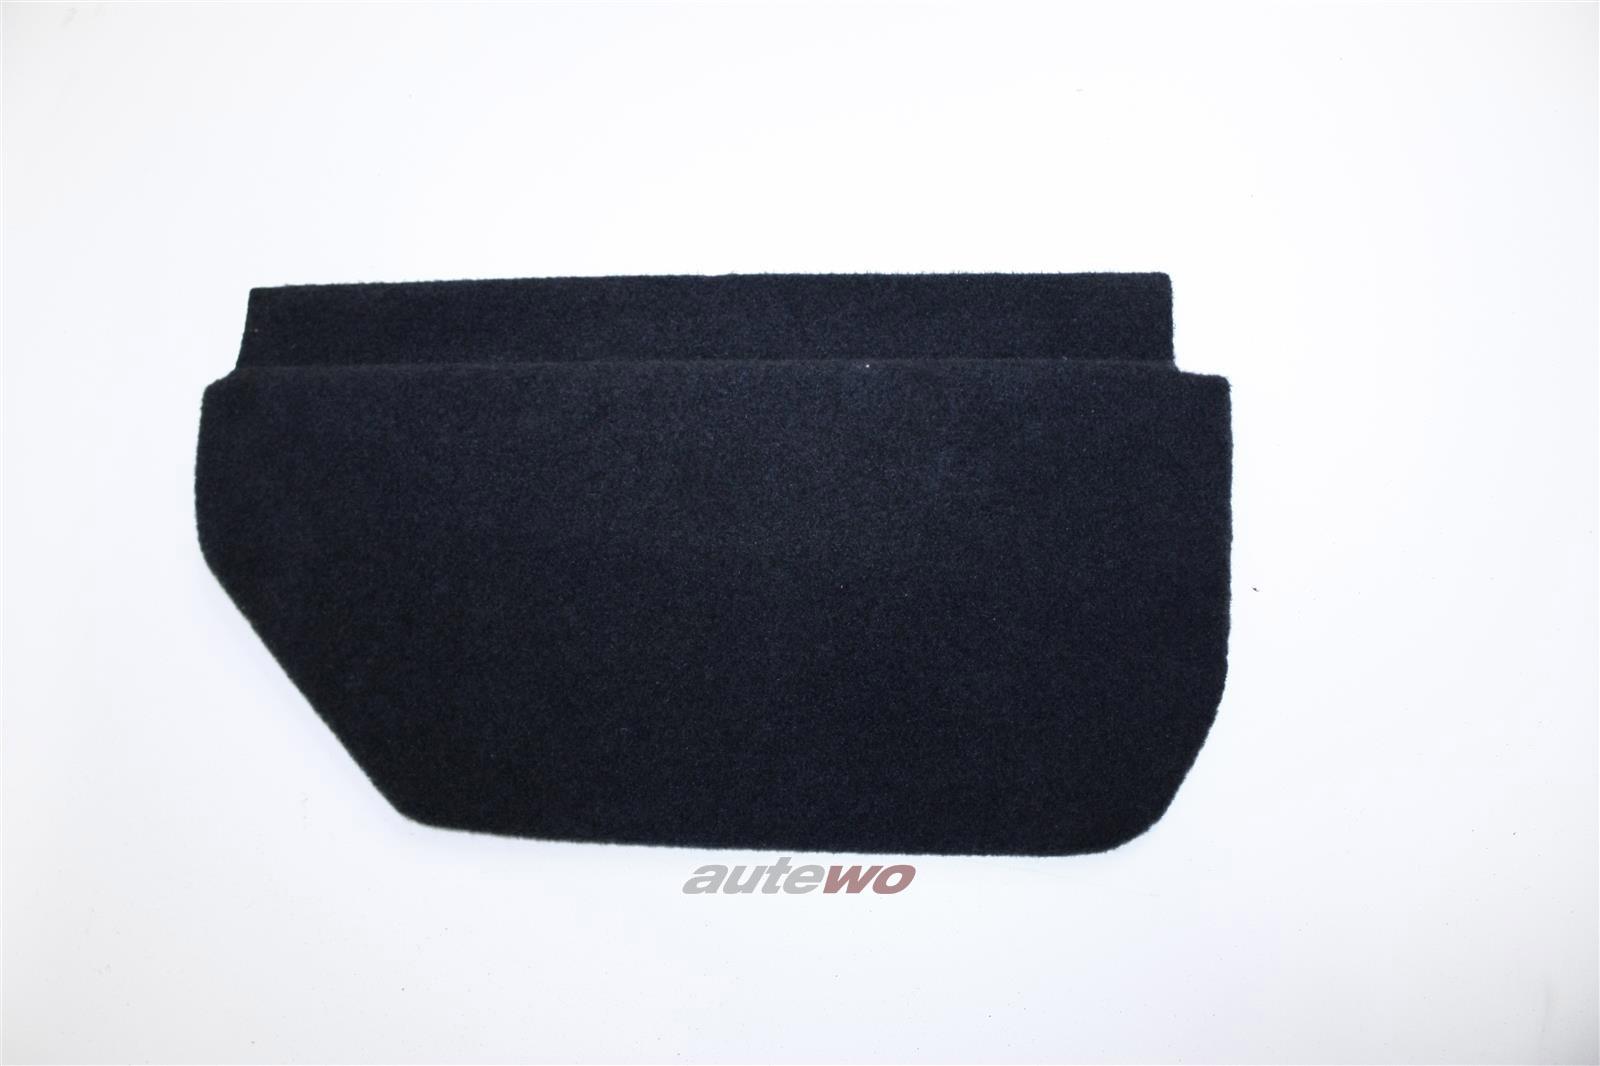 Audi A8/S8 D2 Deckel Batterie für Fzg. mit Standheizung V40 grau 4D0868865C